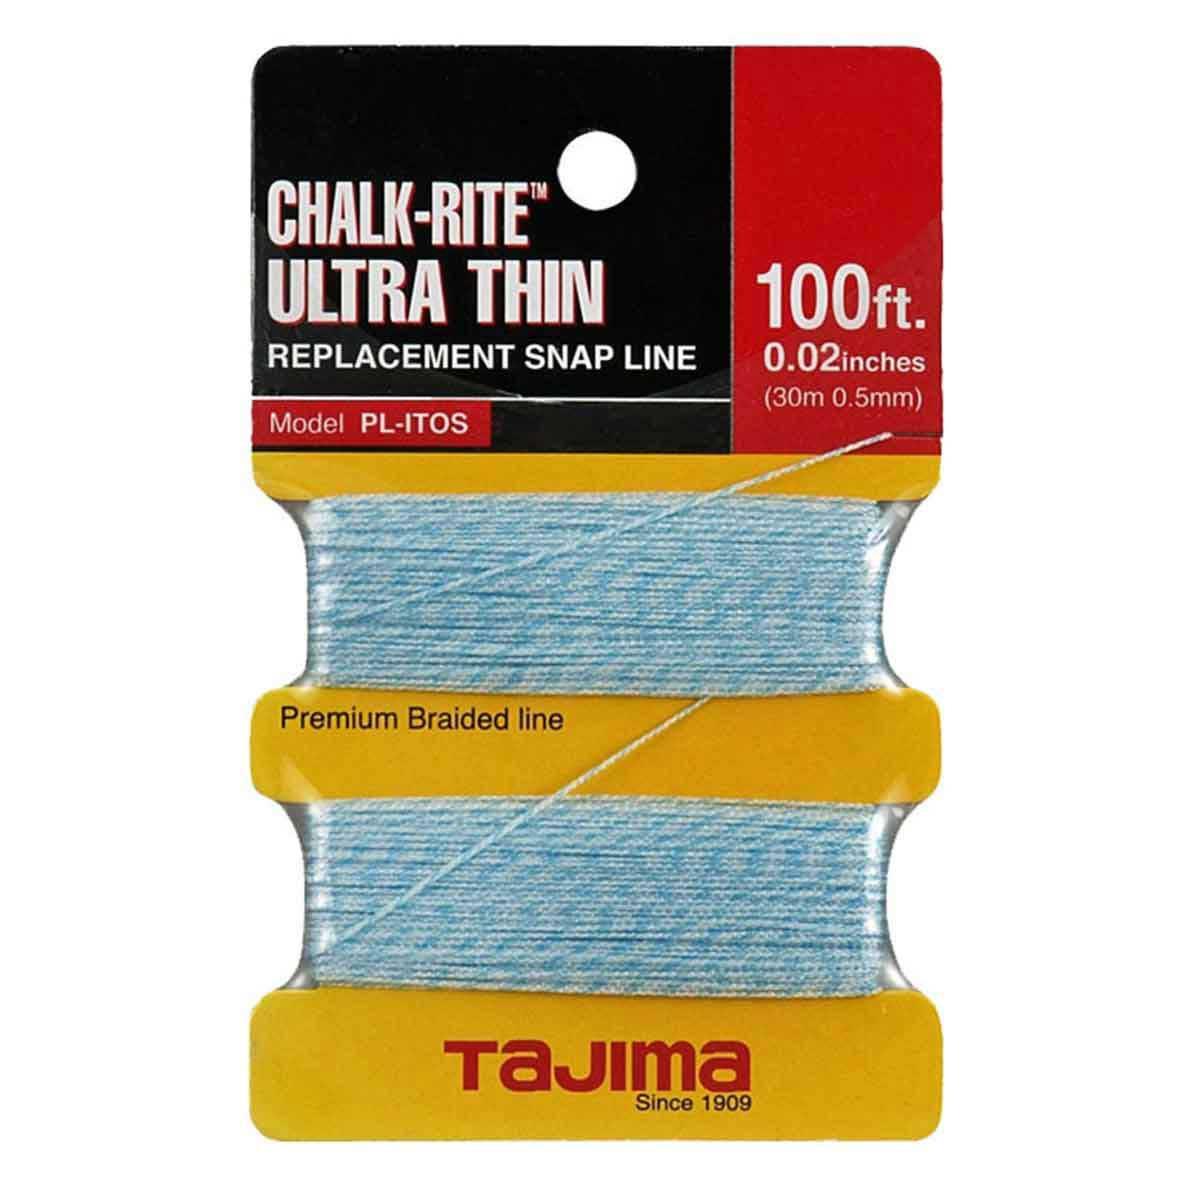 tajima ultra thin braided replacement chalk line